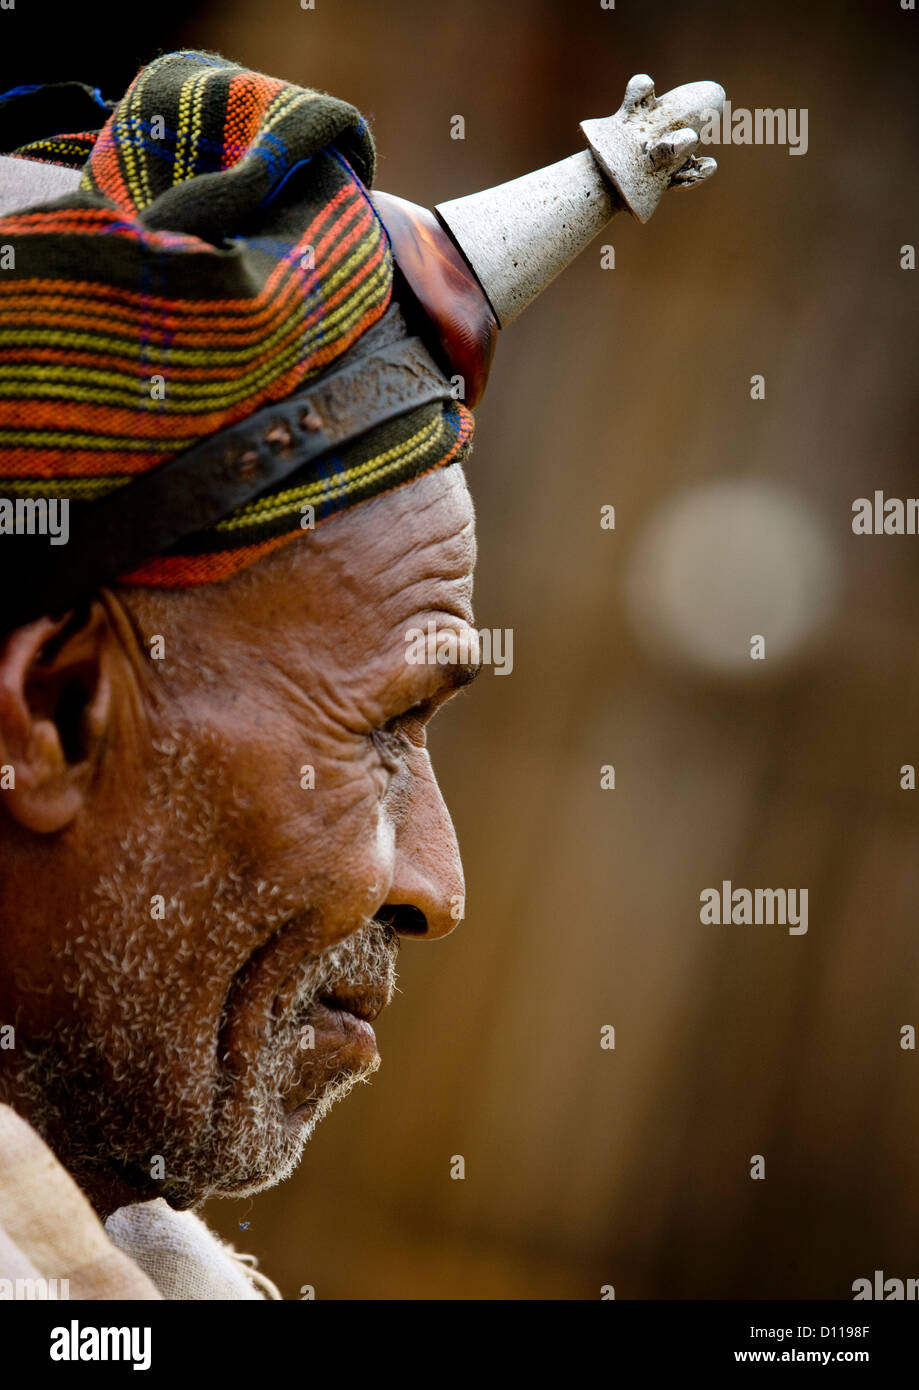 Profile Portrait Of A Borana Tribe Chief Wearing The Kalasha On His Forehead, Yabello, Omo Valley, Ethiopia - Stock Image